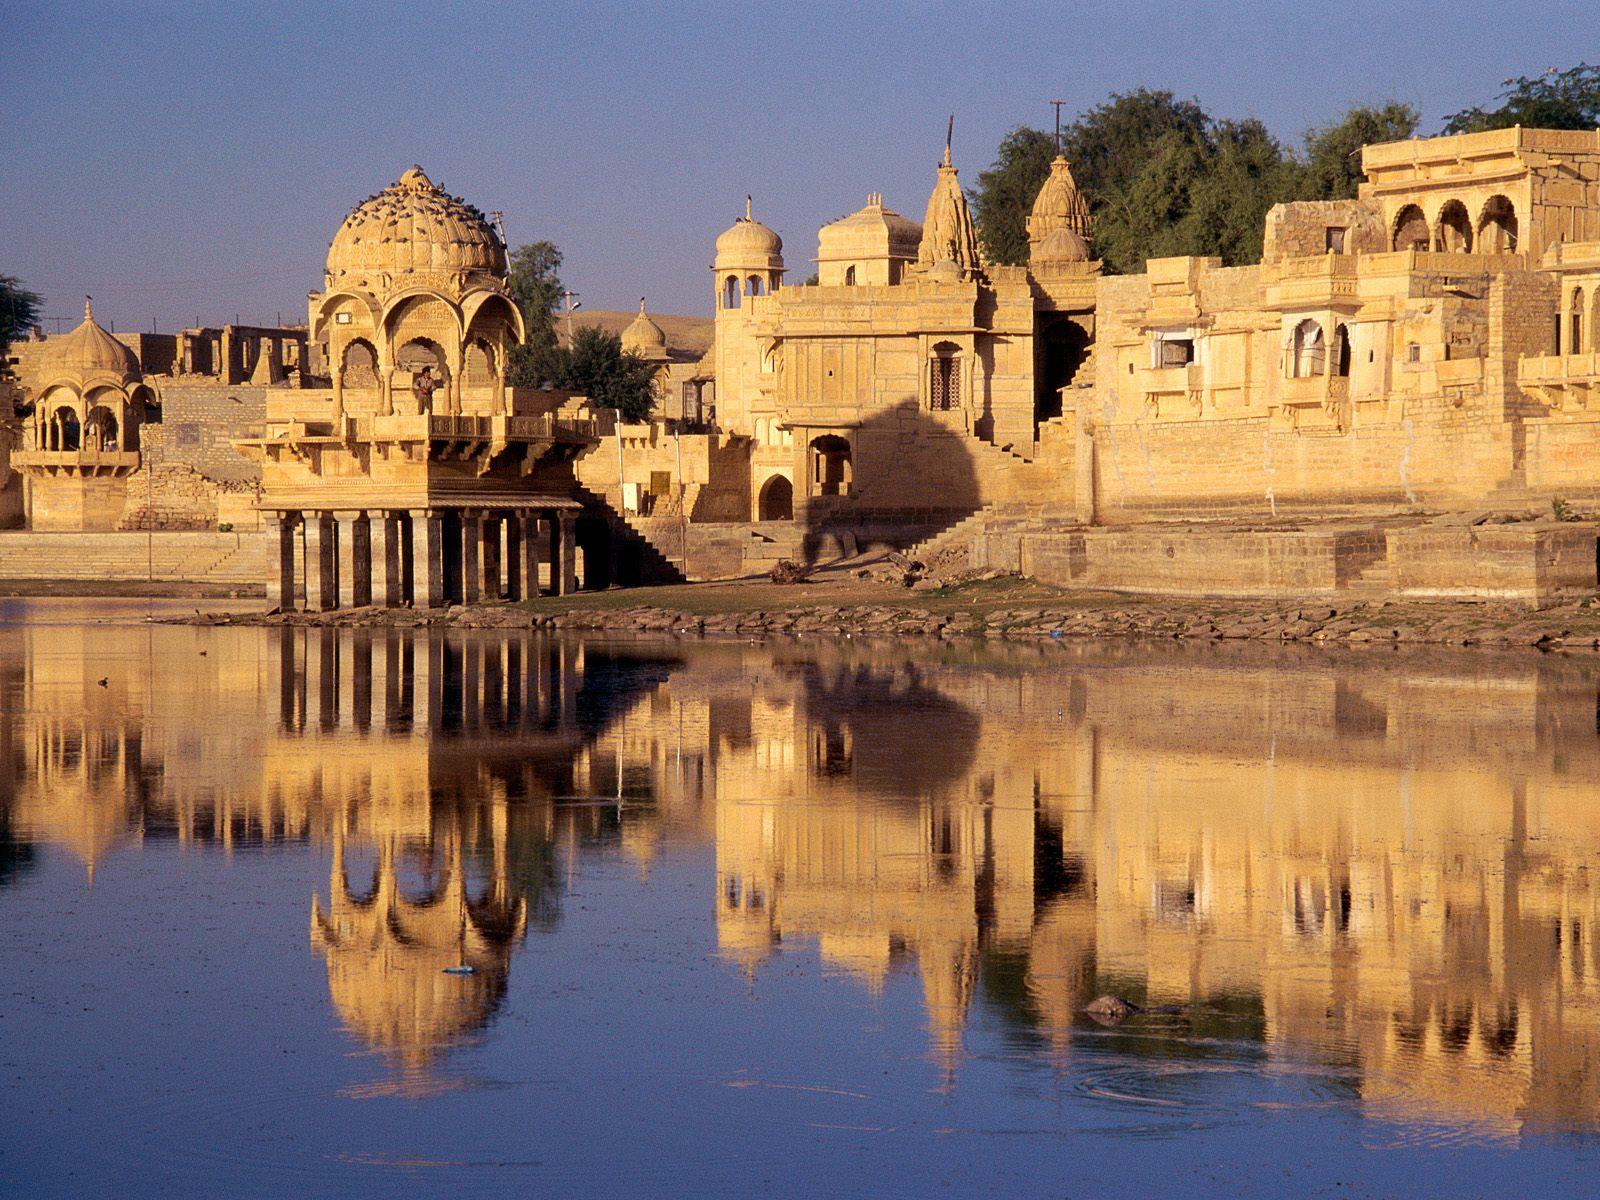 Indija BlognJaisalmer_Rajasthan_India